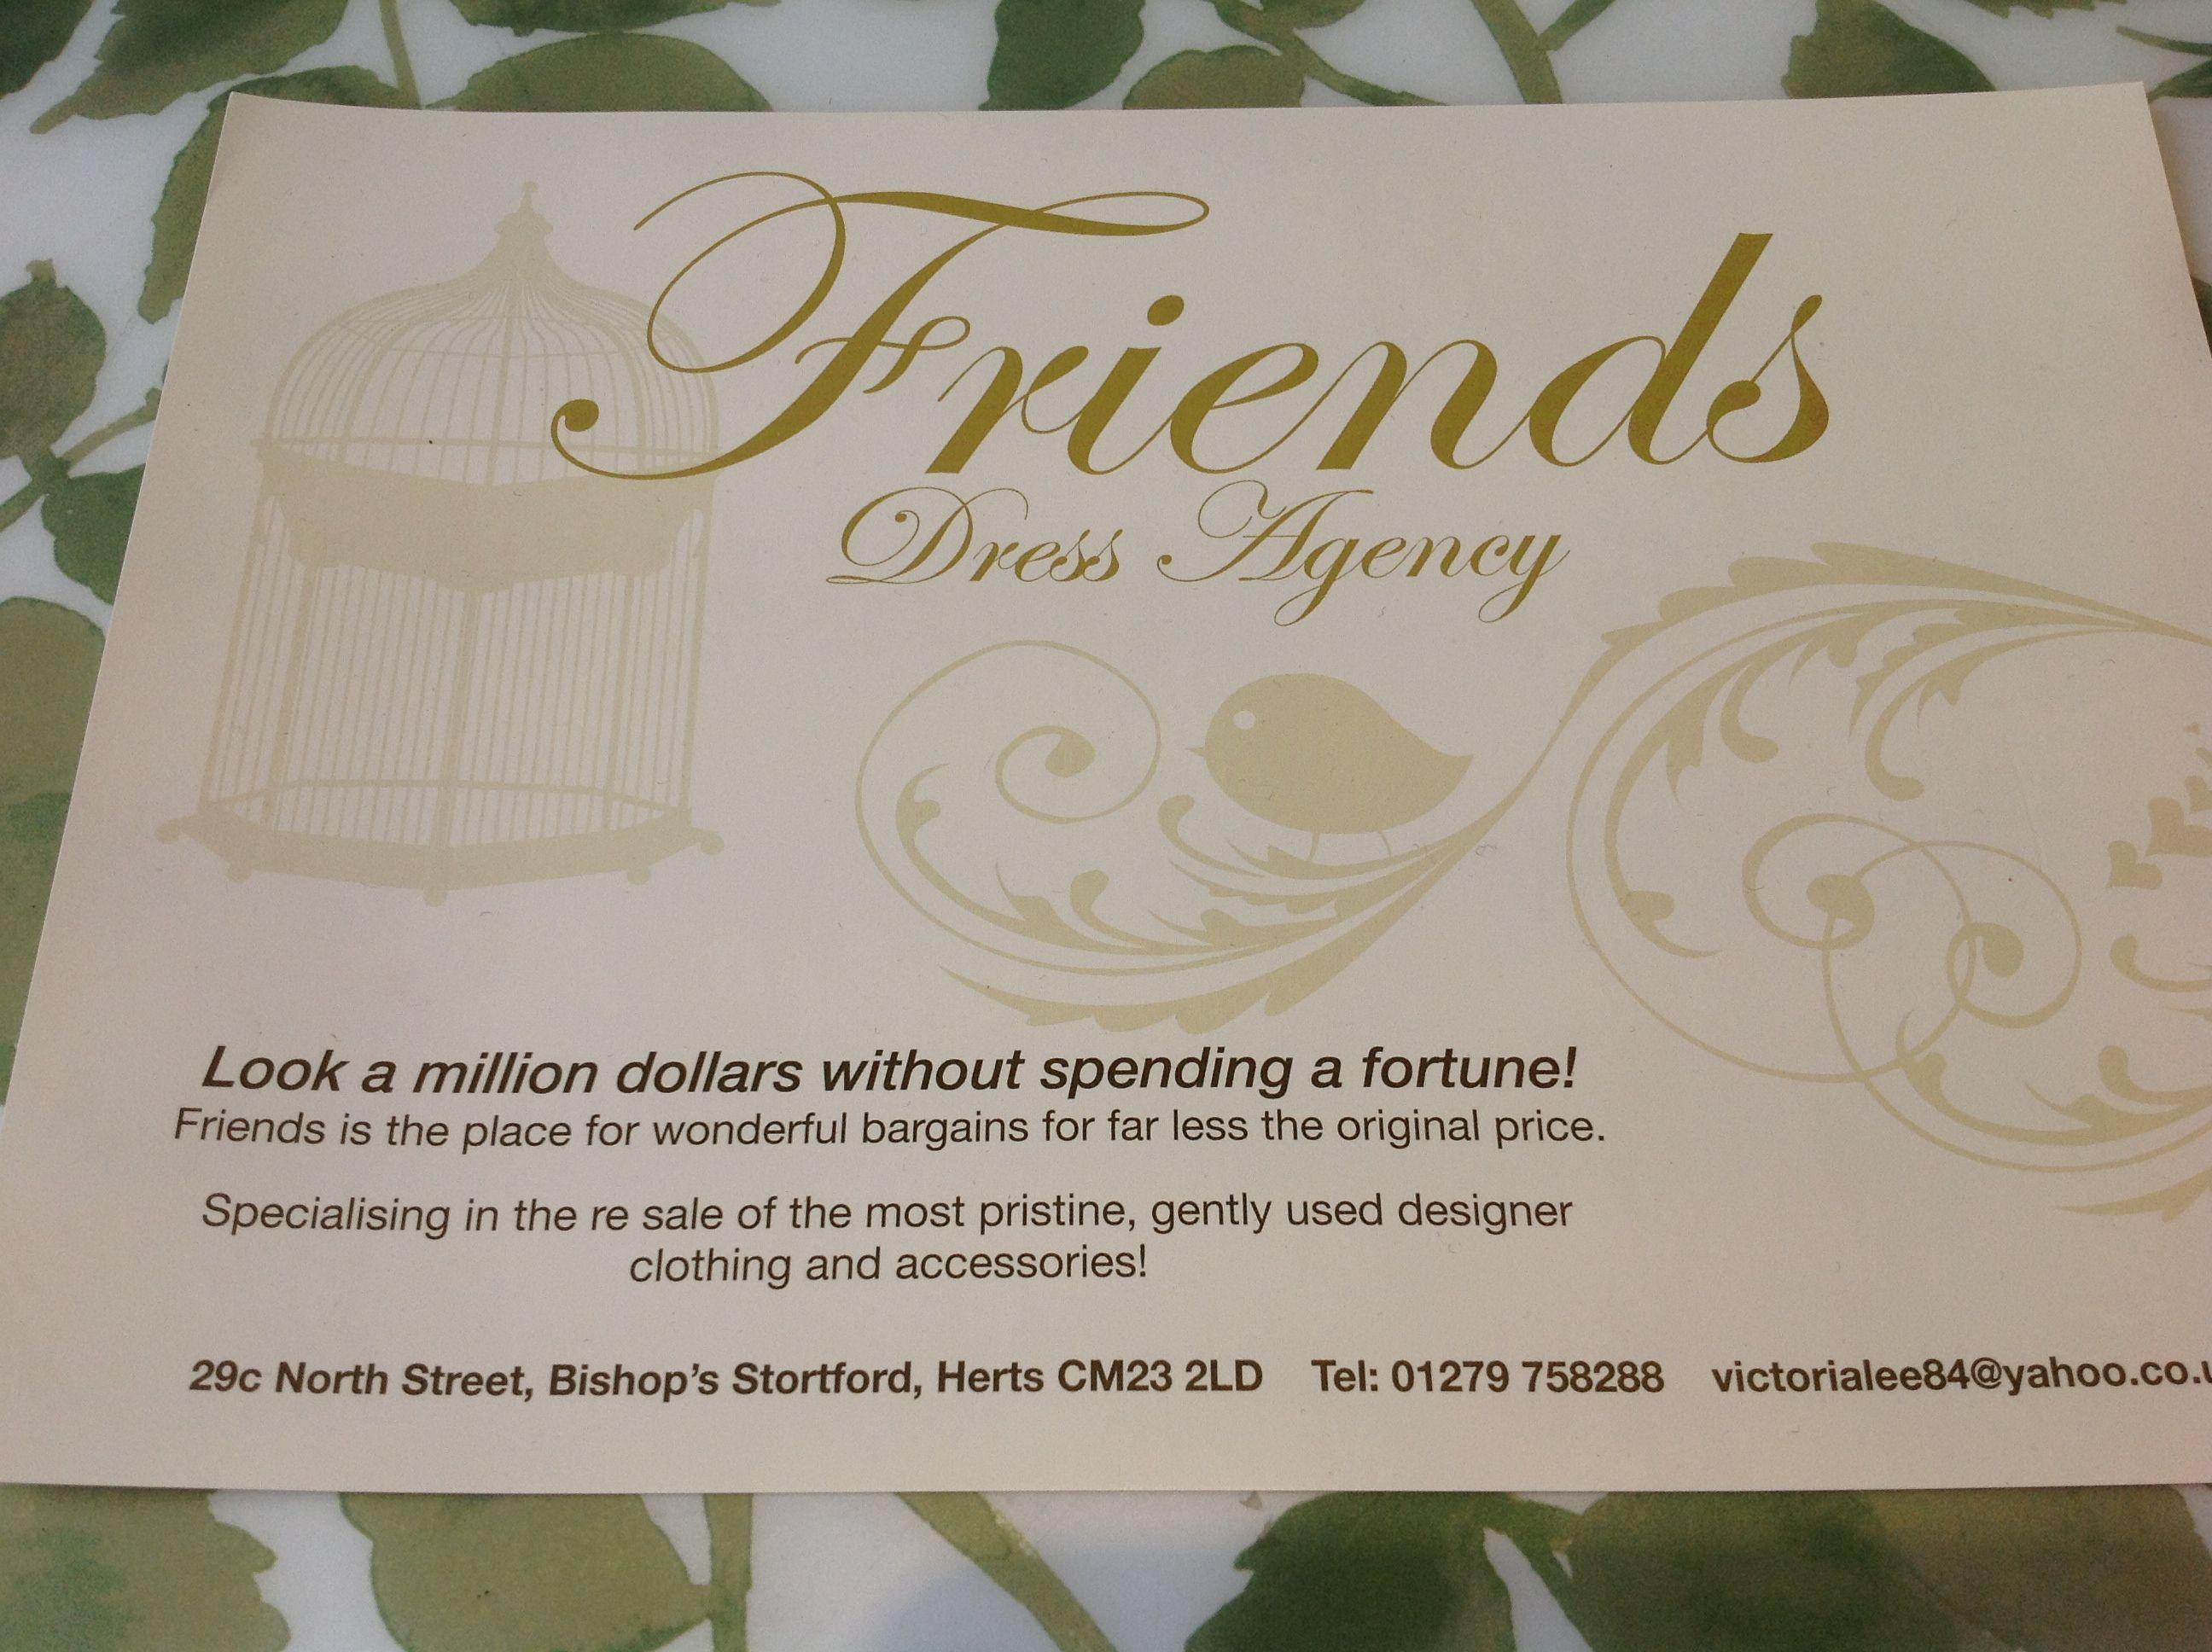 The dress agency - Friends Dress Agency Bishops Stortford Ladies Pre Loved Designer Clothing 01279 758288